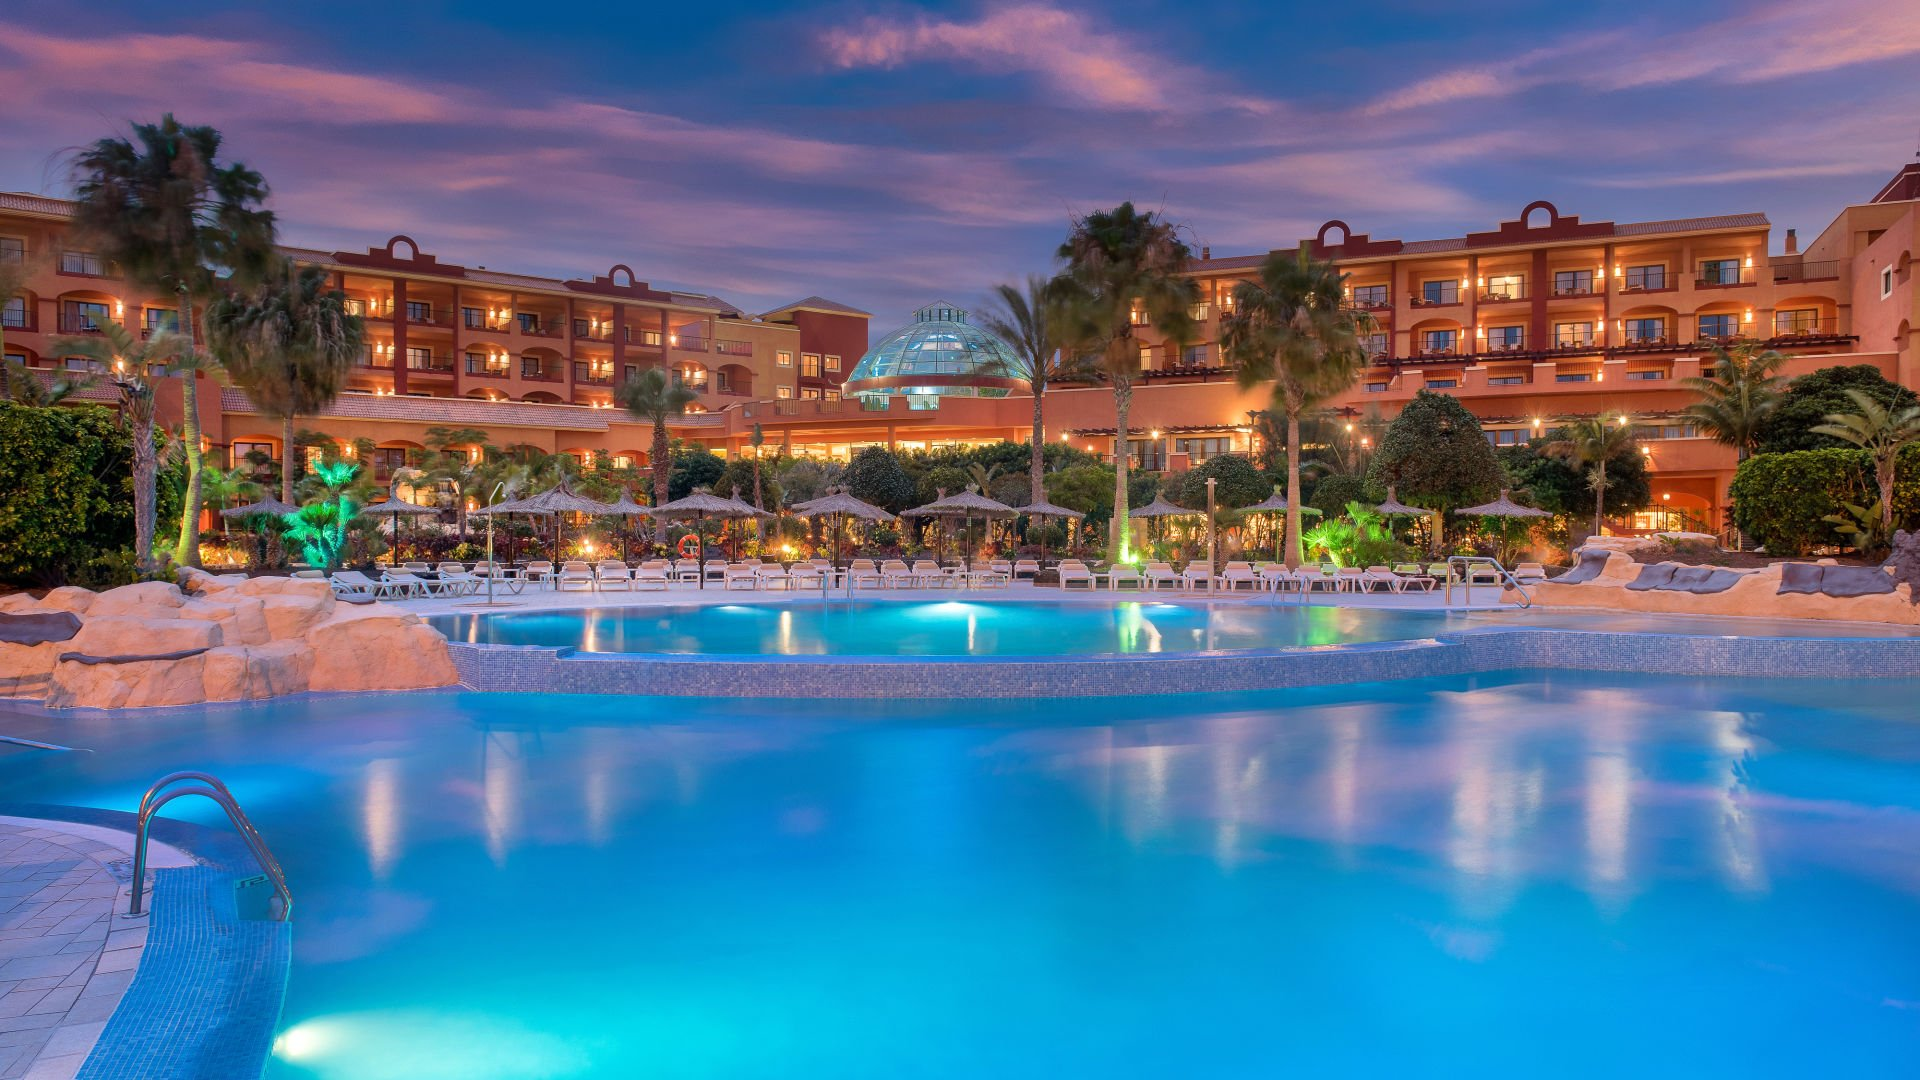 The Sheraton Fuerteventura, a vegan-friendly hotel.